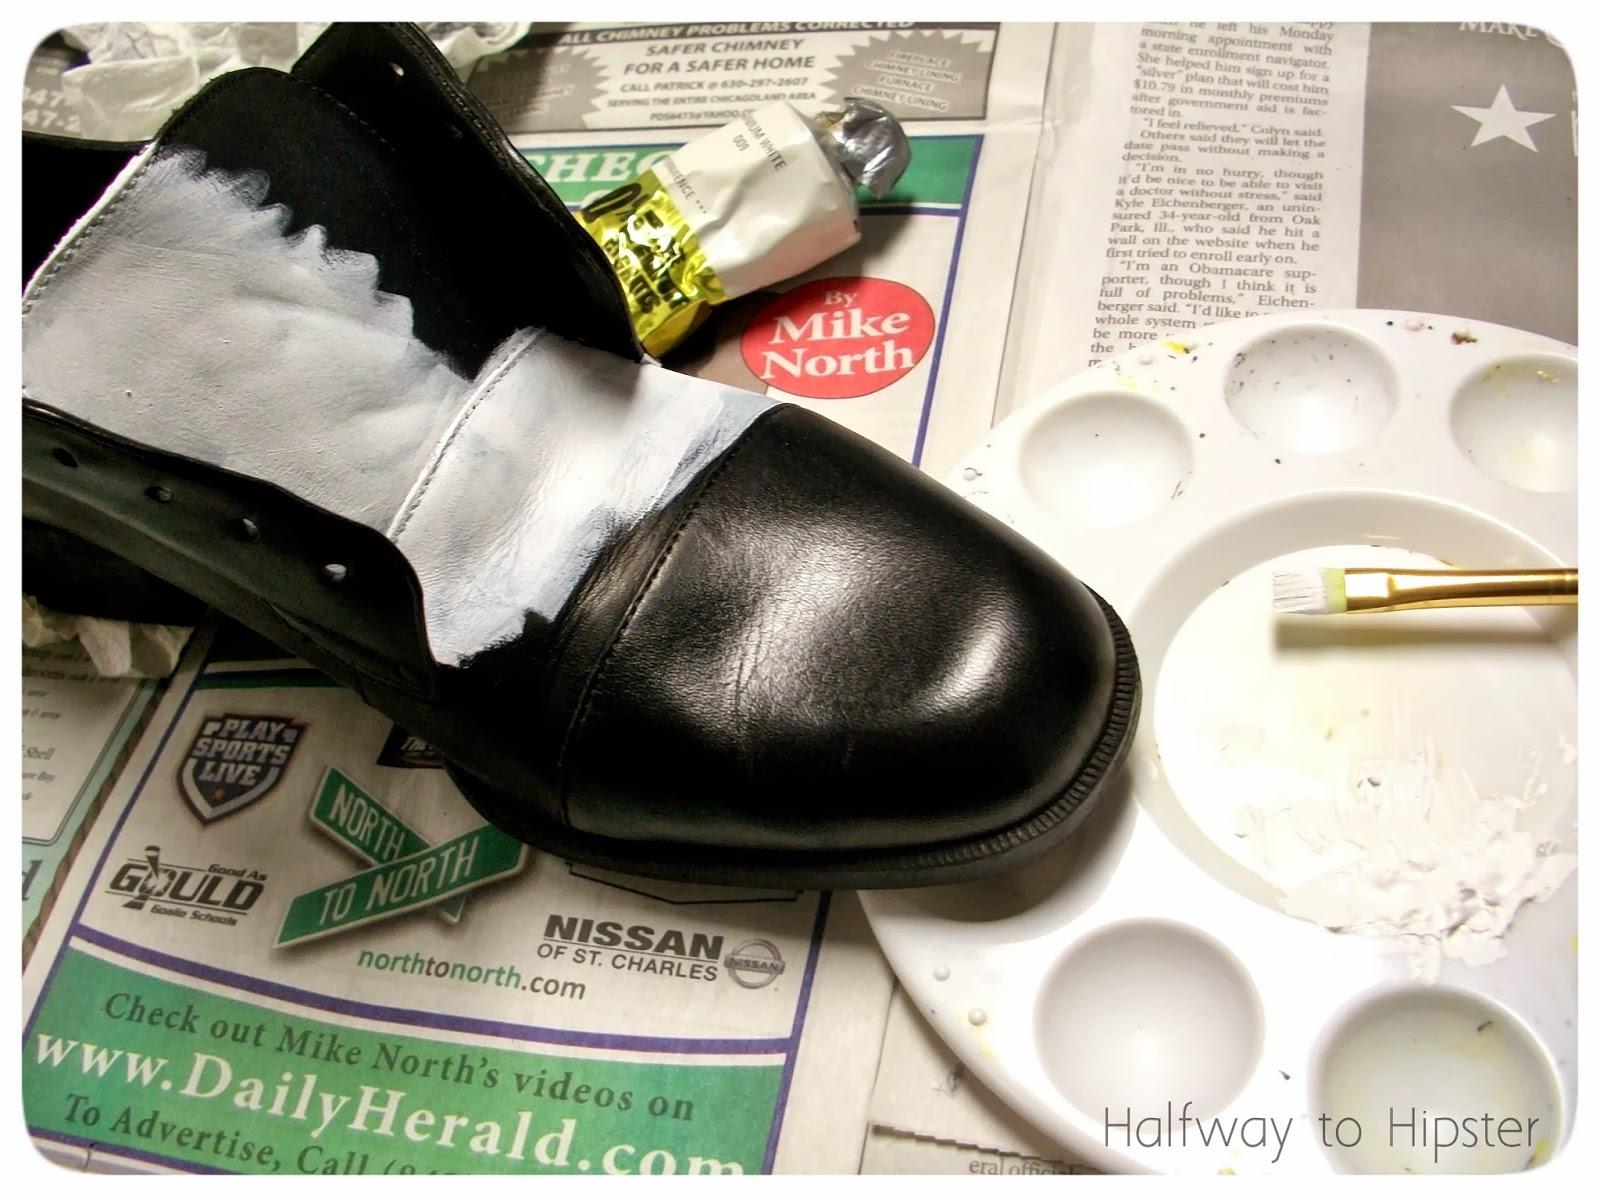 DIY Spectator Shoes